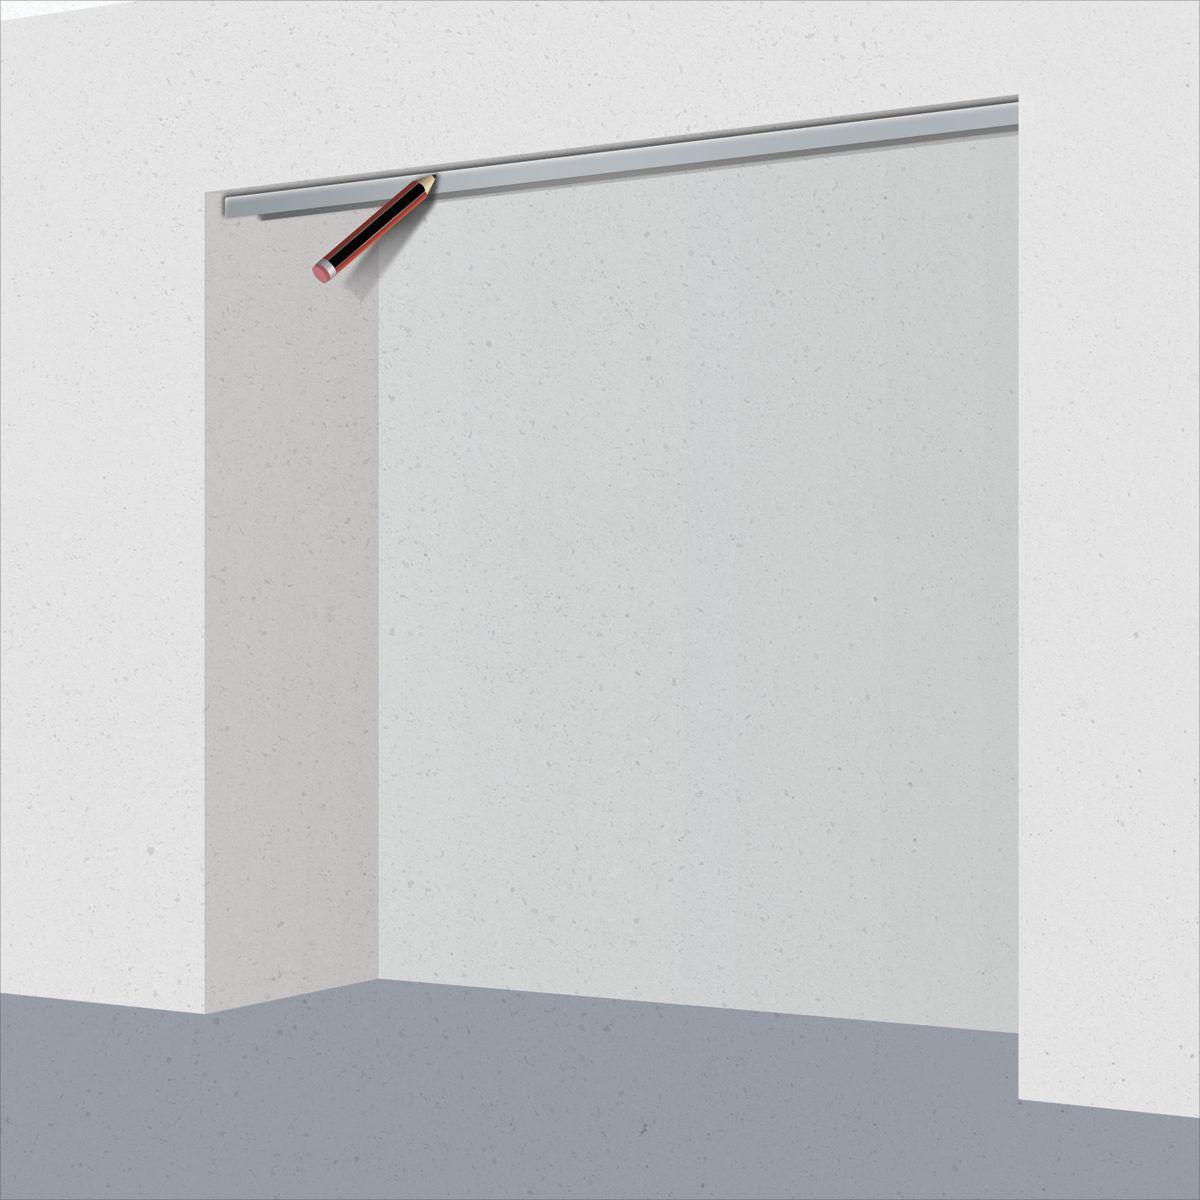 Ante scorrevoli armadio a muro simple armadio scorrevole for Ante su misura leroy merlin